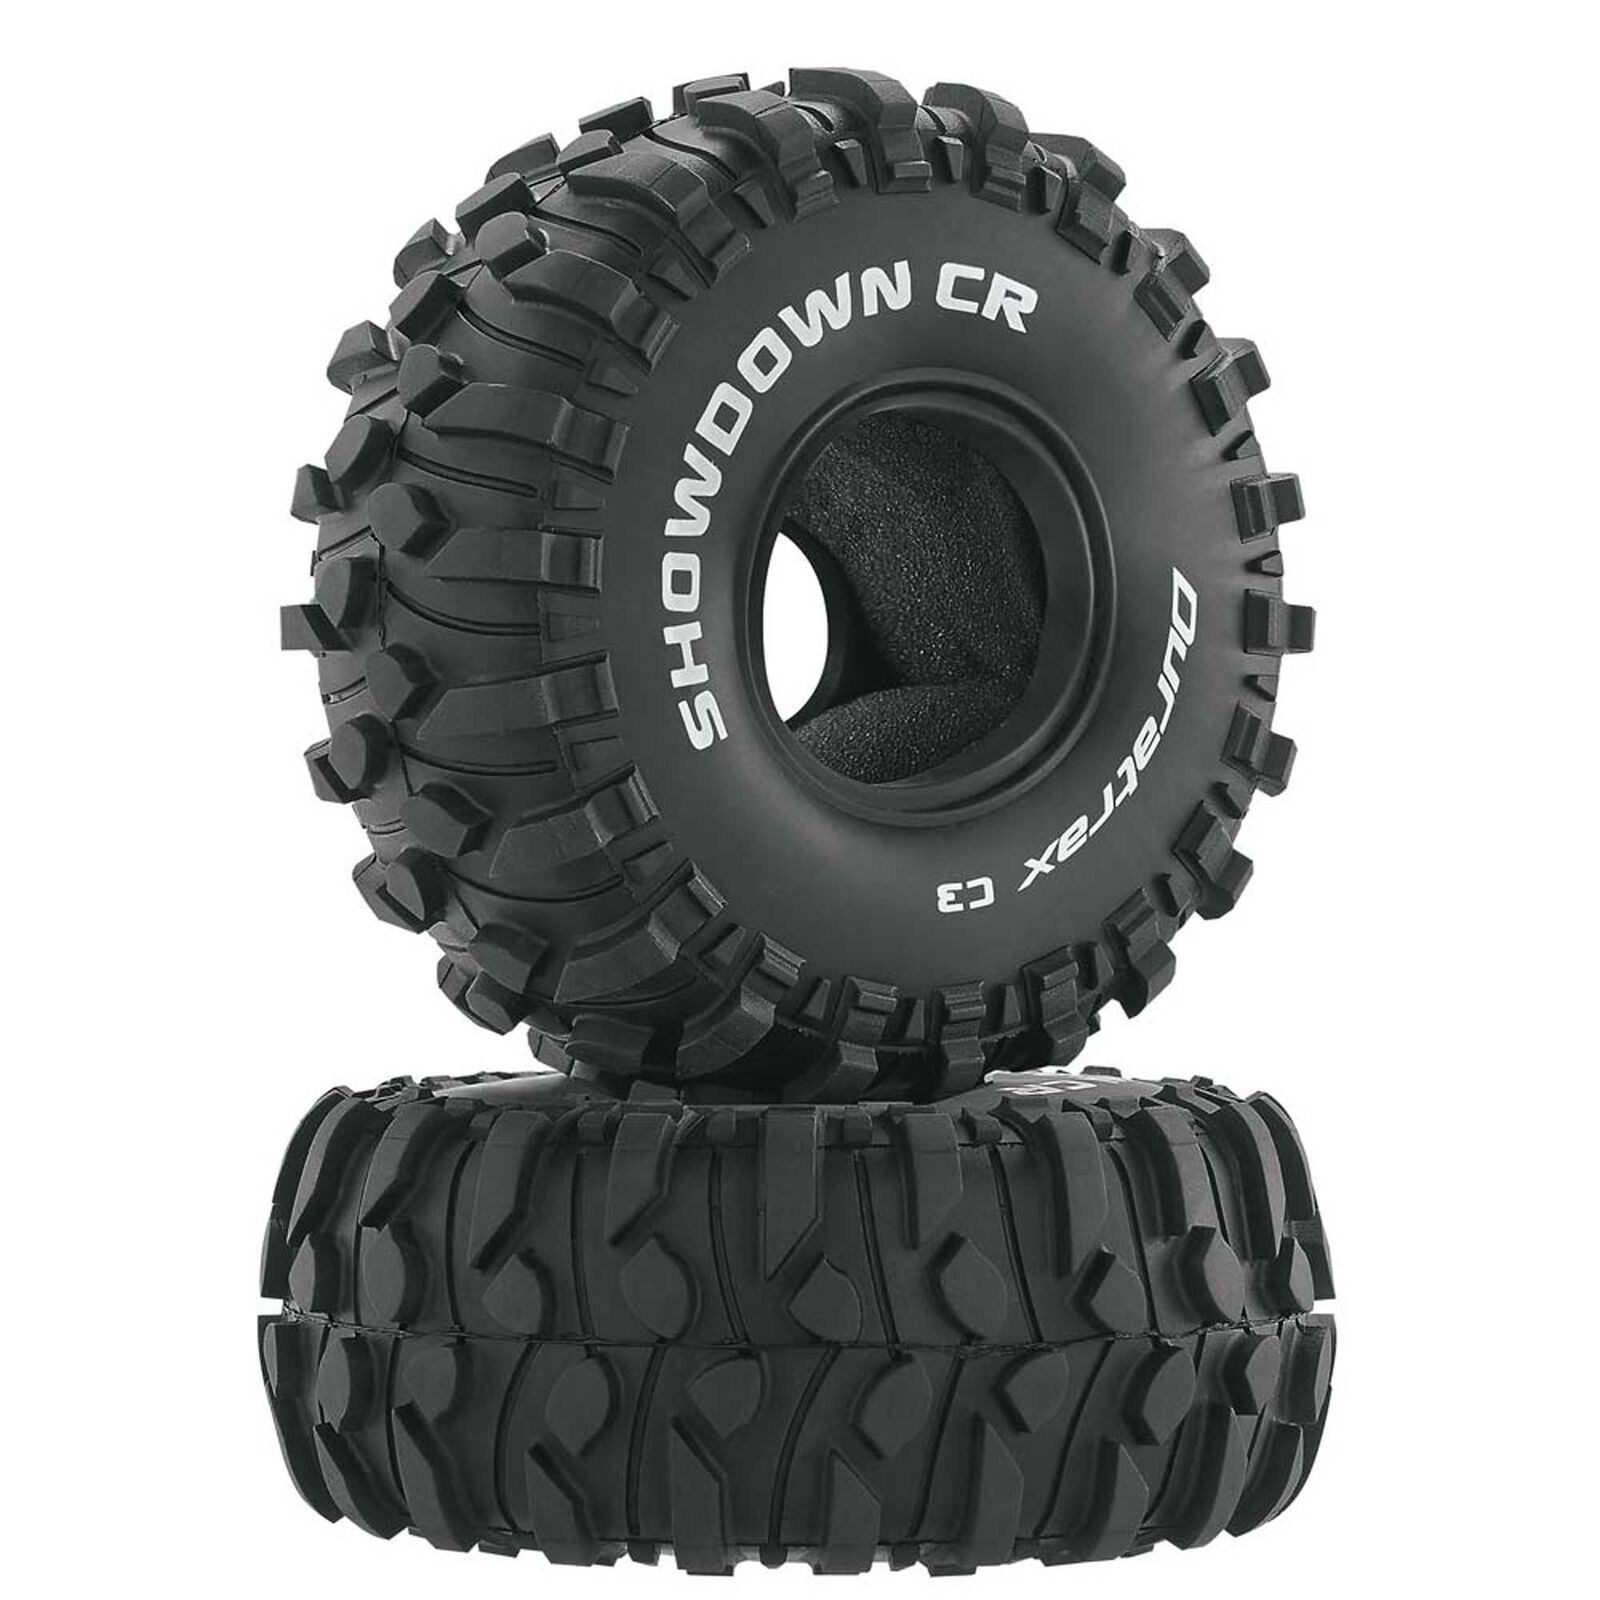 "Showdown CR 1.9"" Crawler Tires C3 (2)"